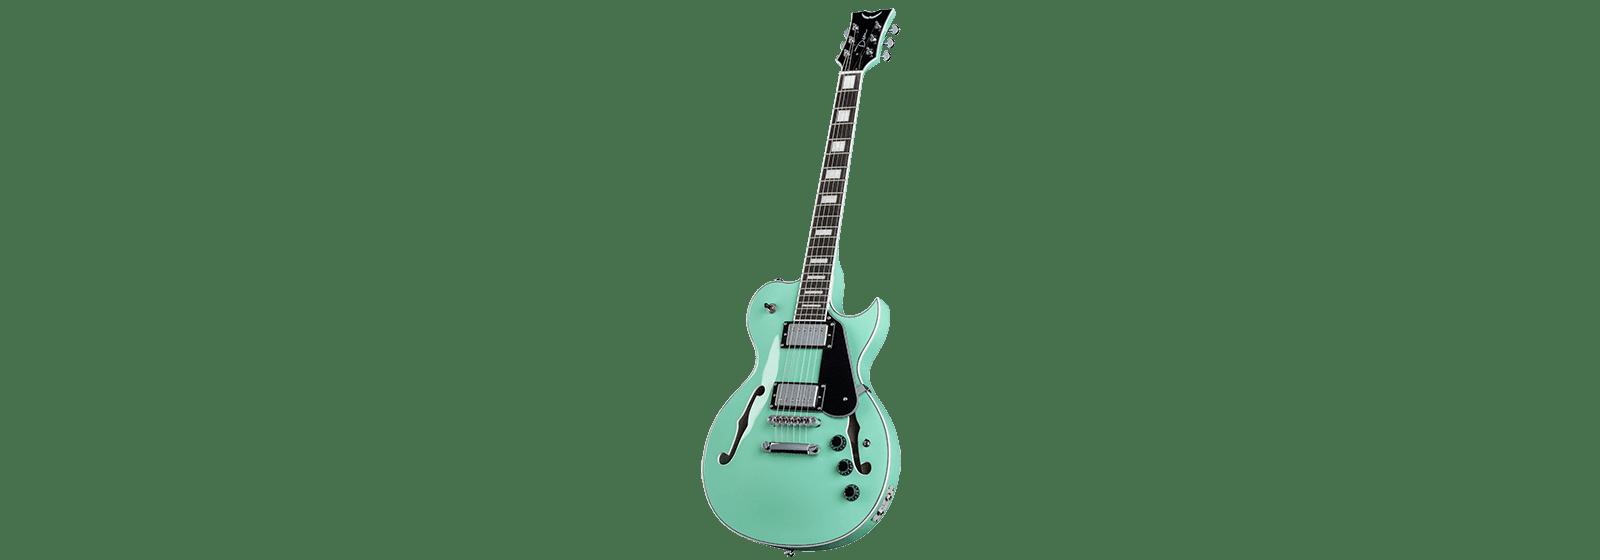 Dean Shire Semi Hollow Body Electric Guitar w  Piezo Aqua by Overstock